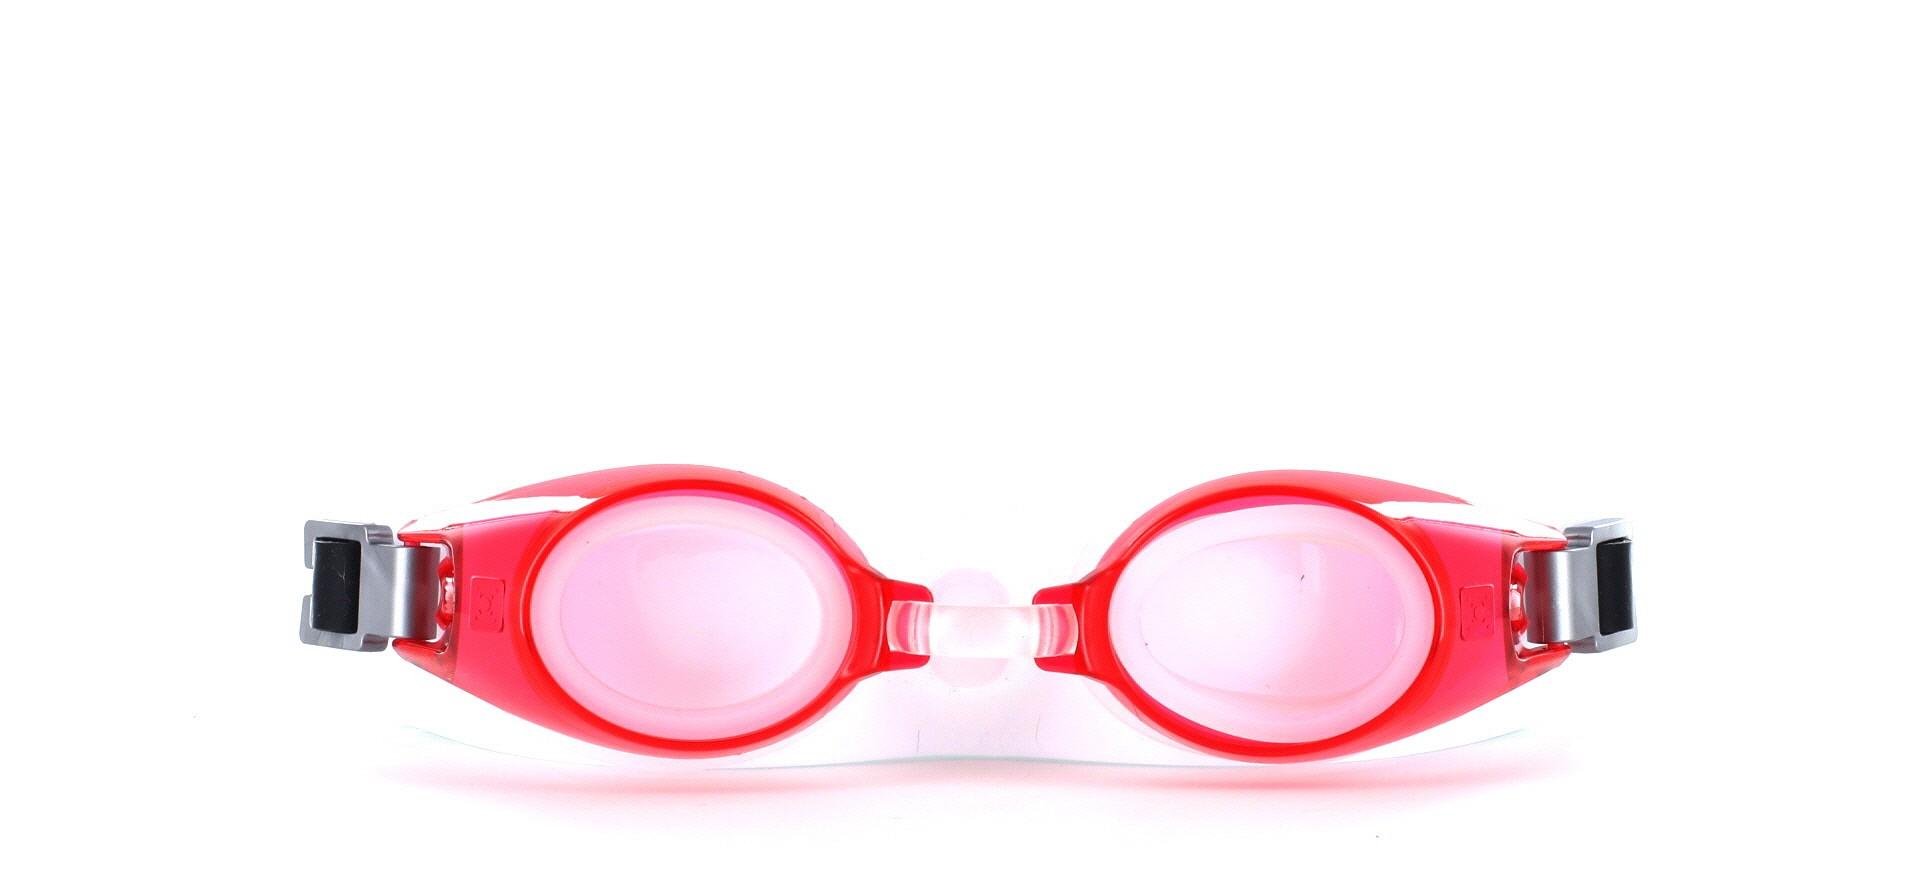 B&S Ocean Jr. - optische Schwimmbrille - Rot